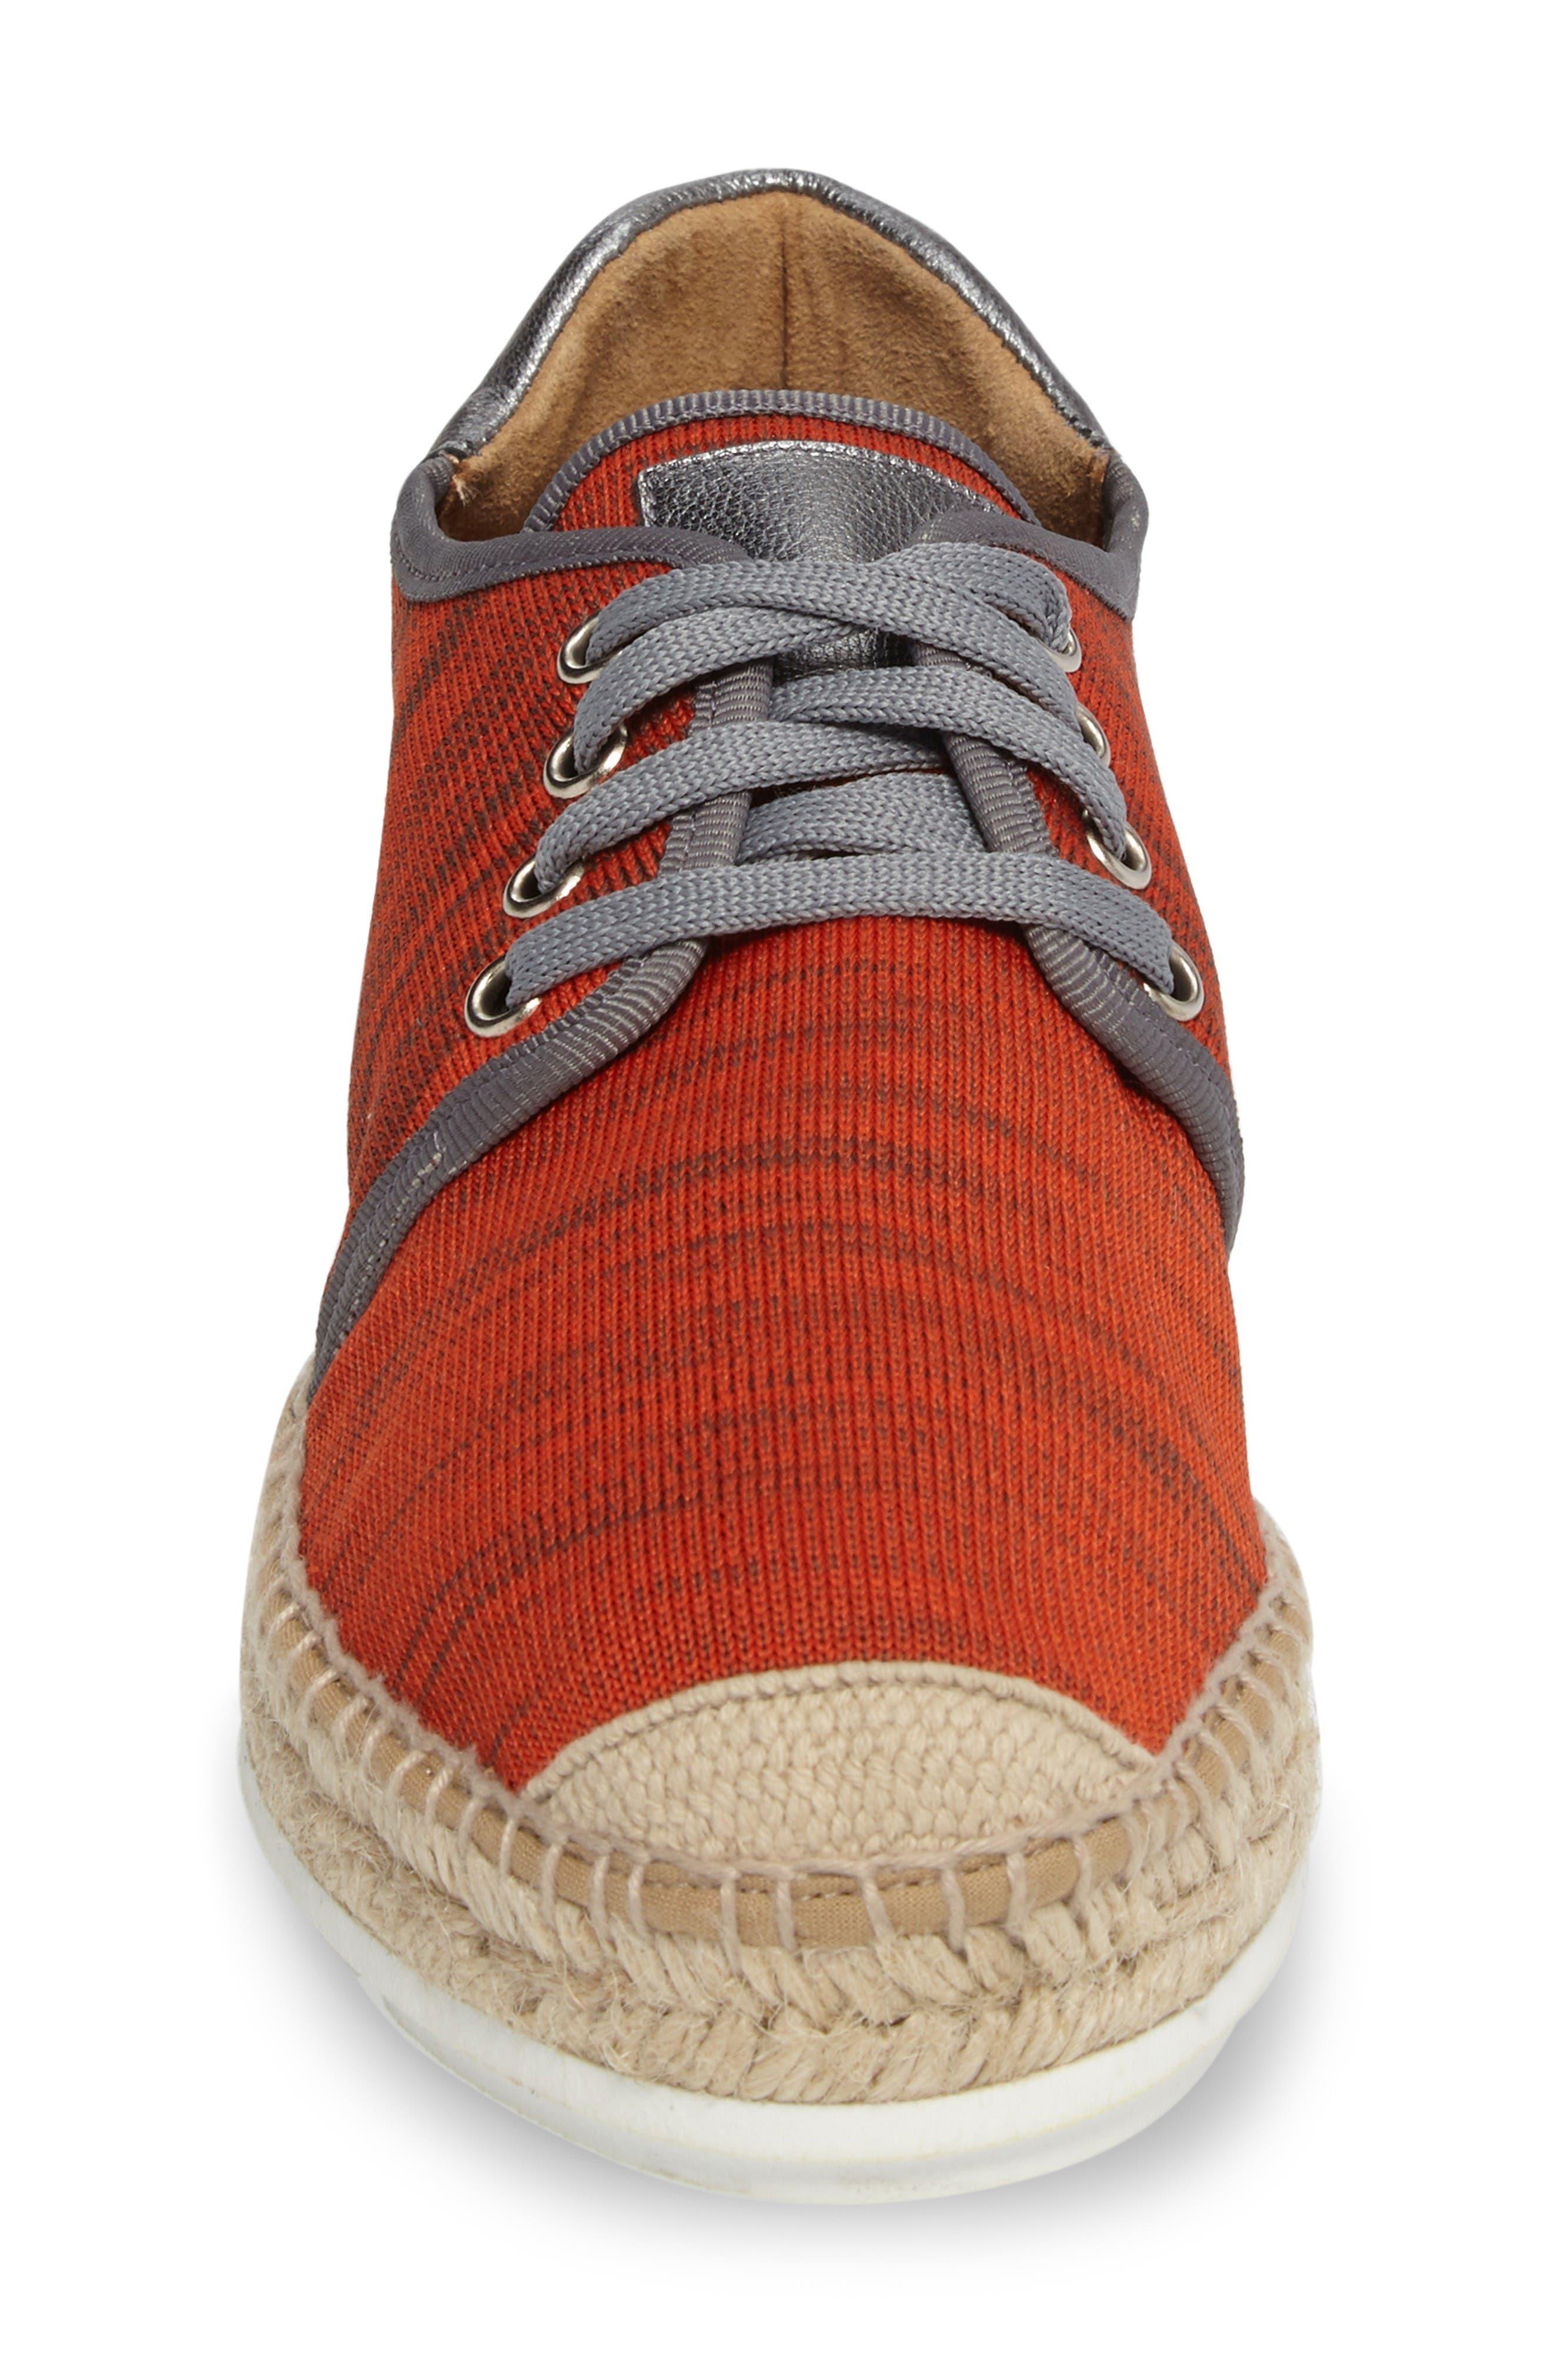 Alternate Image 4  - Bettye Muller Newport Mesh Espadrille Sneaker (Women)